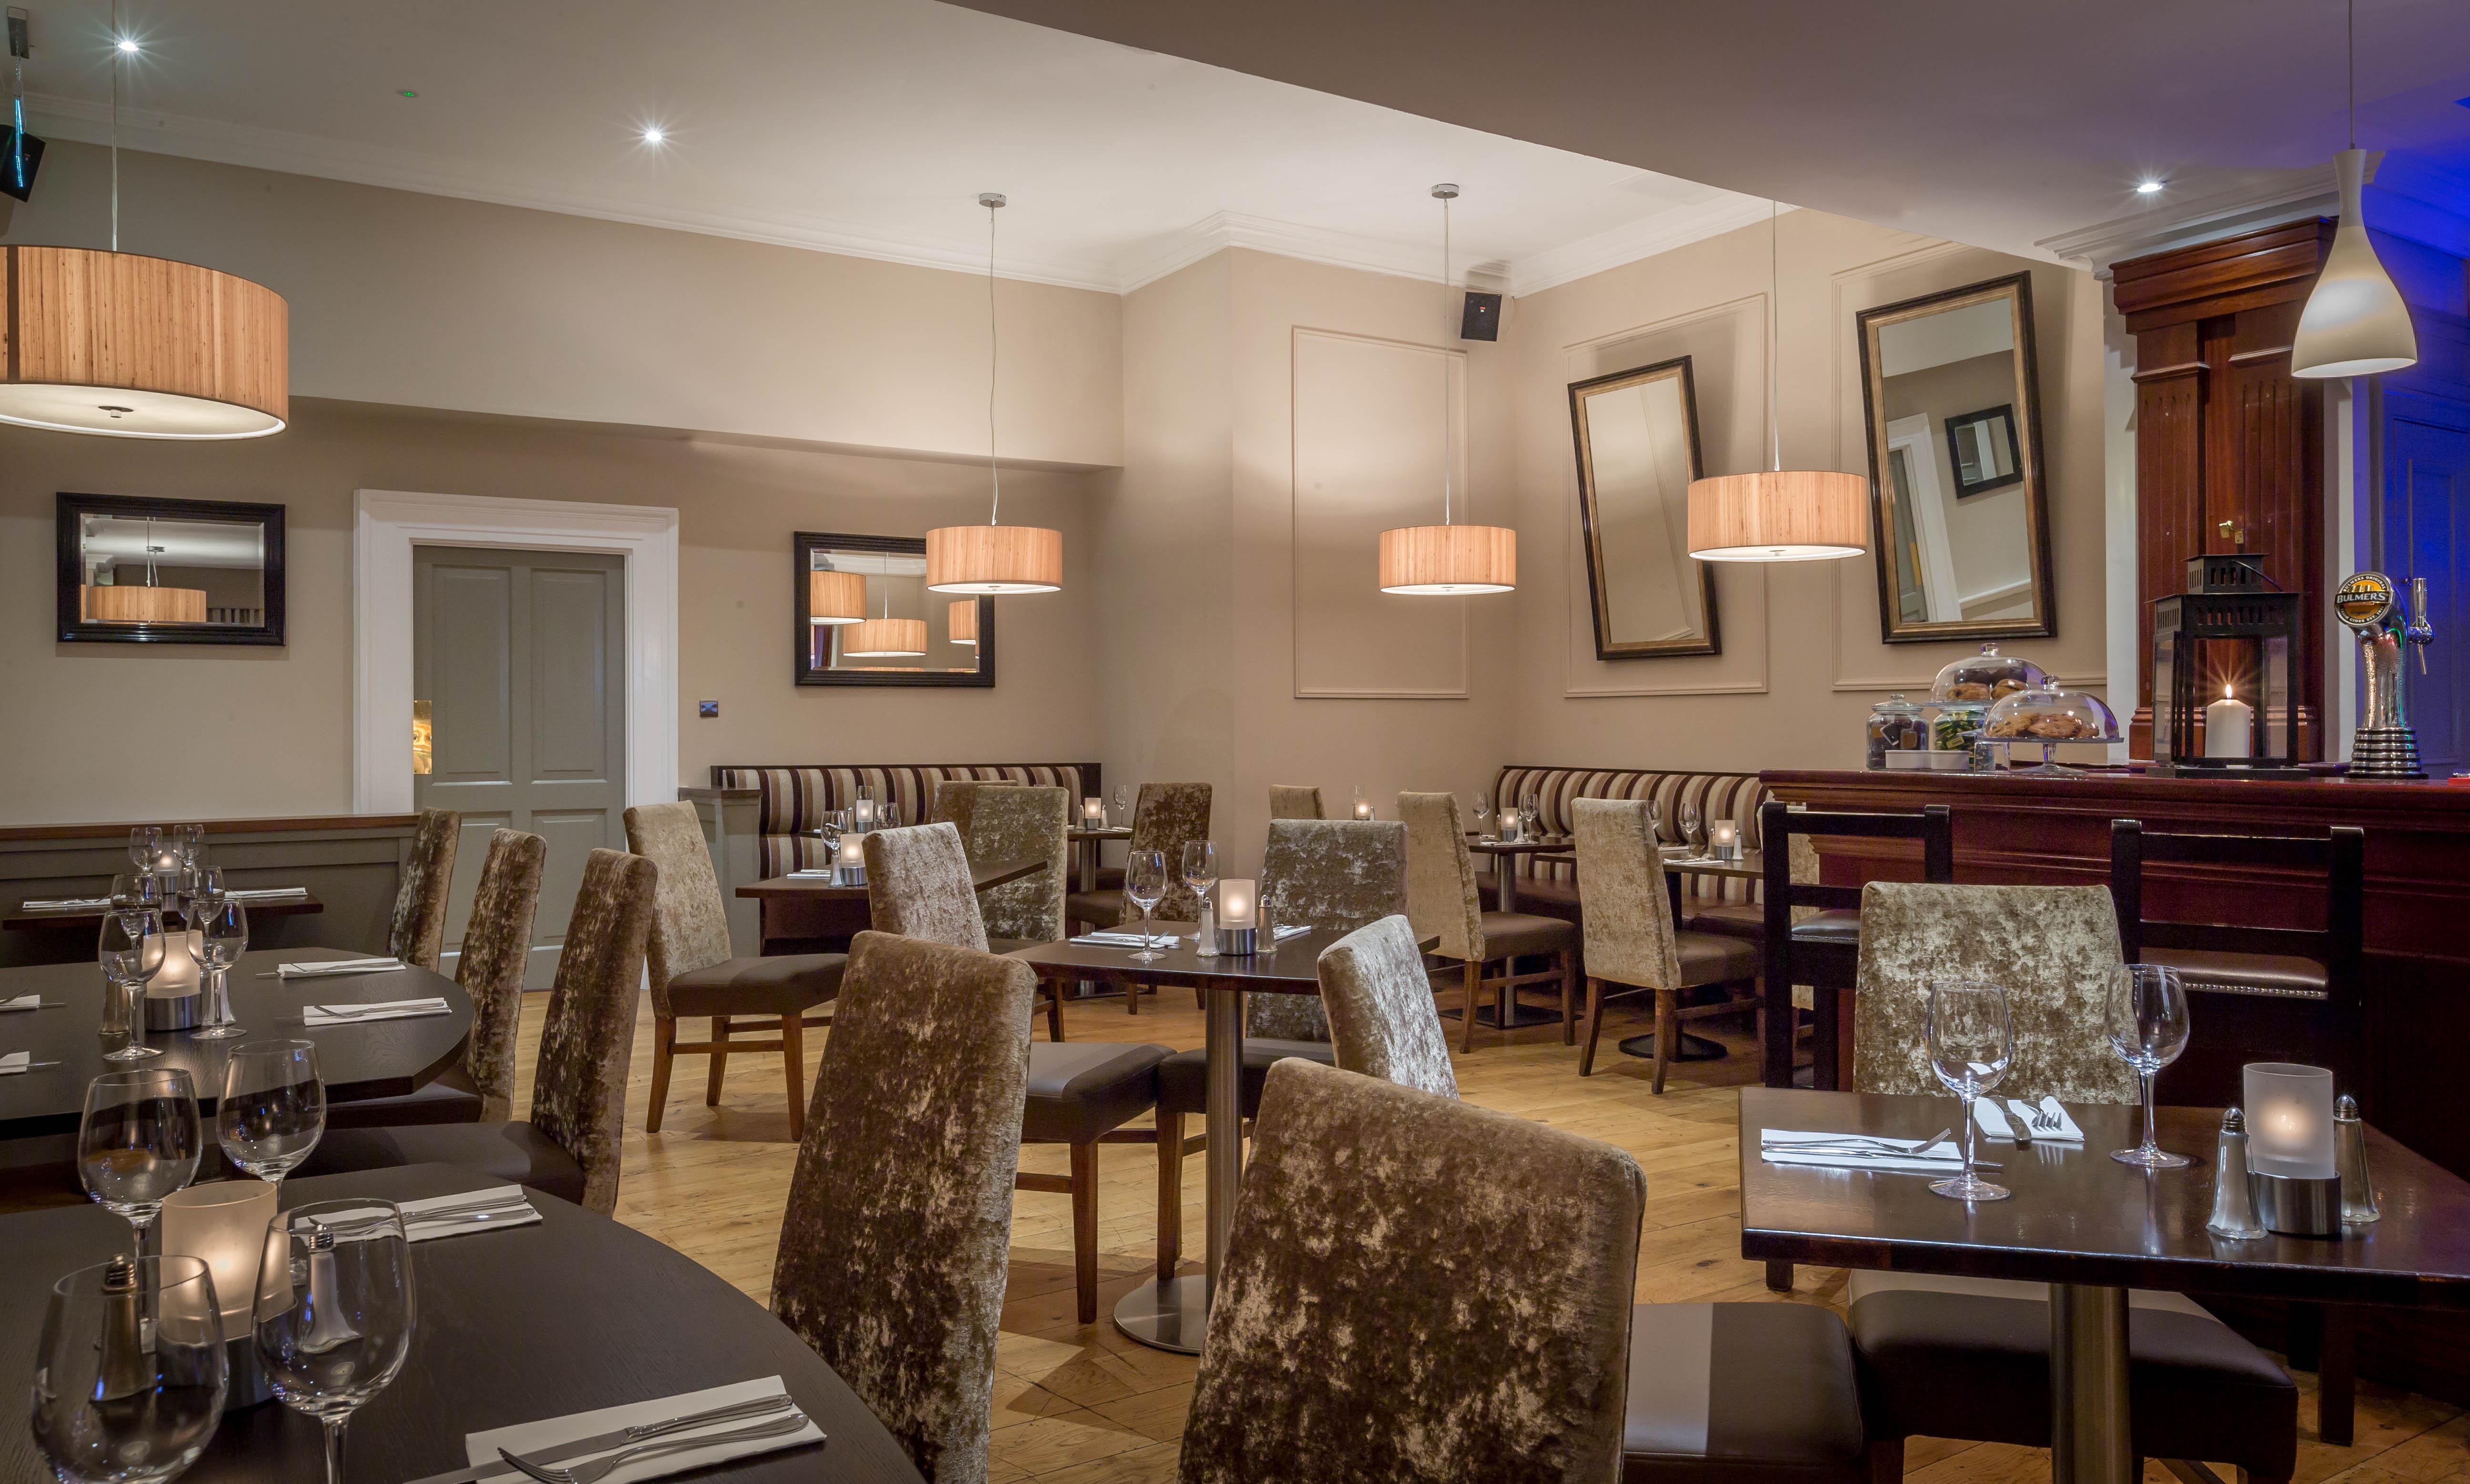 Belvedere-Hotel-Bar-Restaurant-1